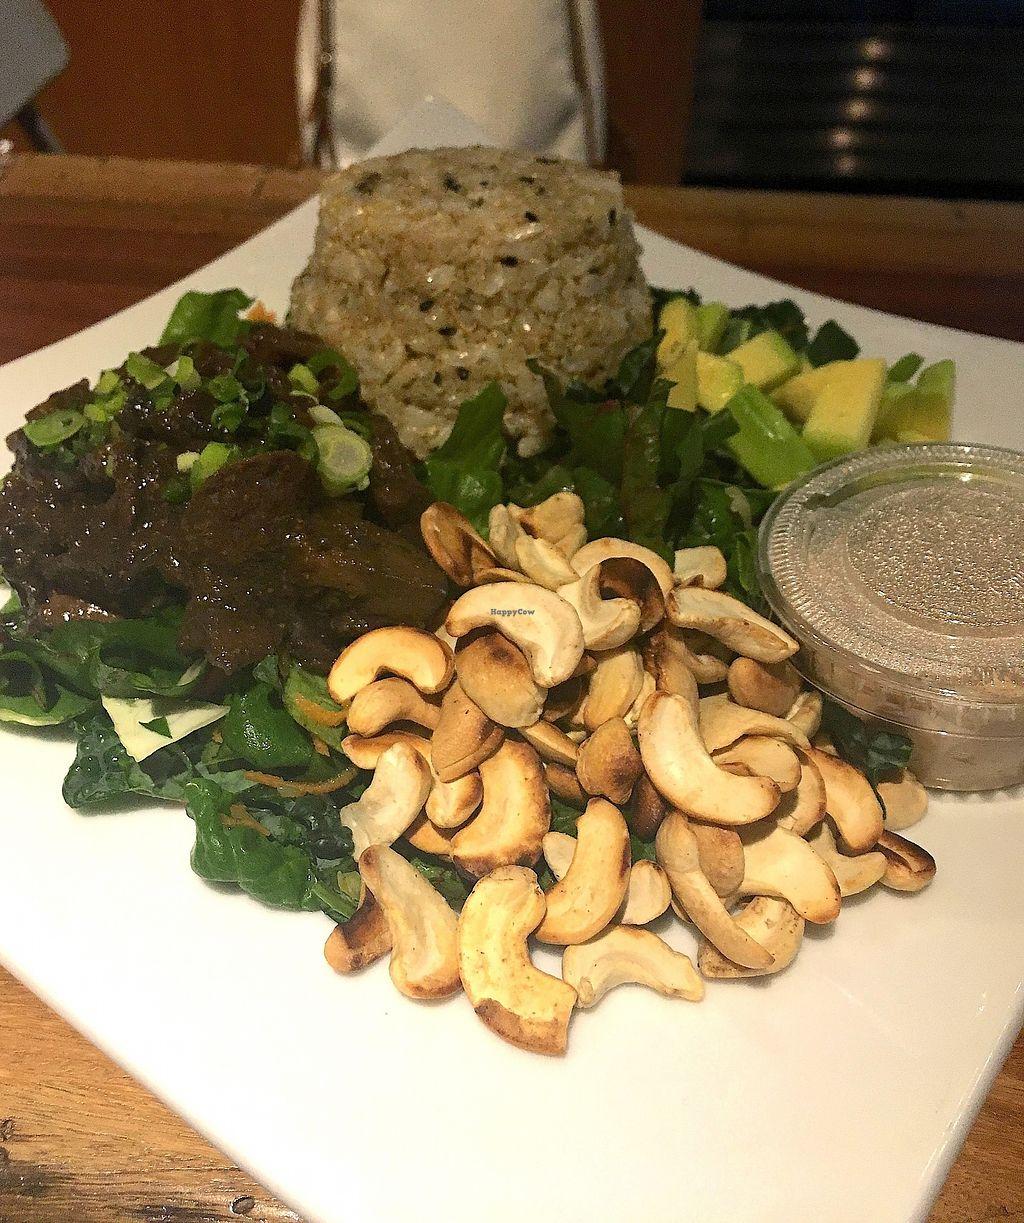 "Photo of Atmana Juiceria  by <a href=""/members/profile/CrisyRivera"">CrisyRivera</a> <br/>Seitan in asian sauce, brown rice, avocado salad, peanut butter sauce.  <br/> November 11, 2017  - <a href='/contact/abuse/image/90148/324392'>Report</a>"